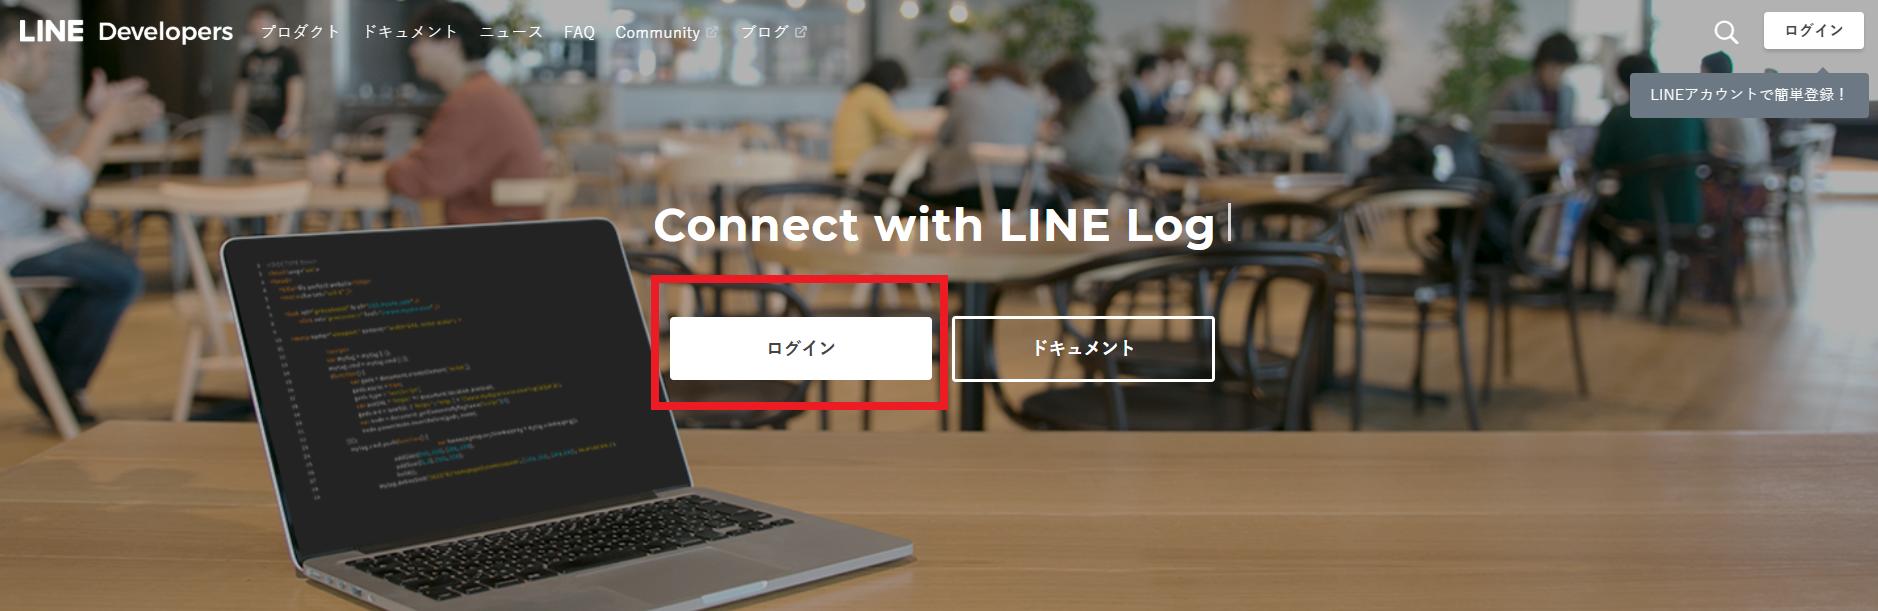 LINE Developers